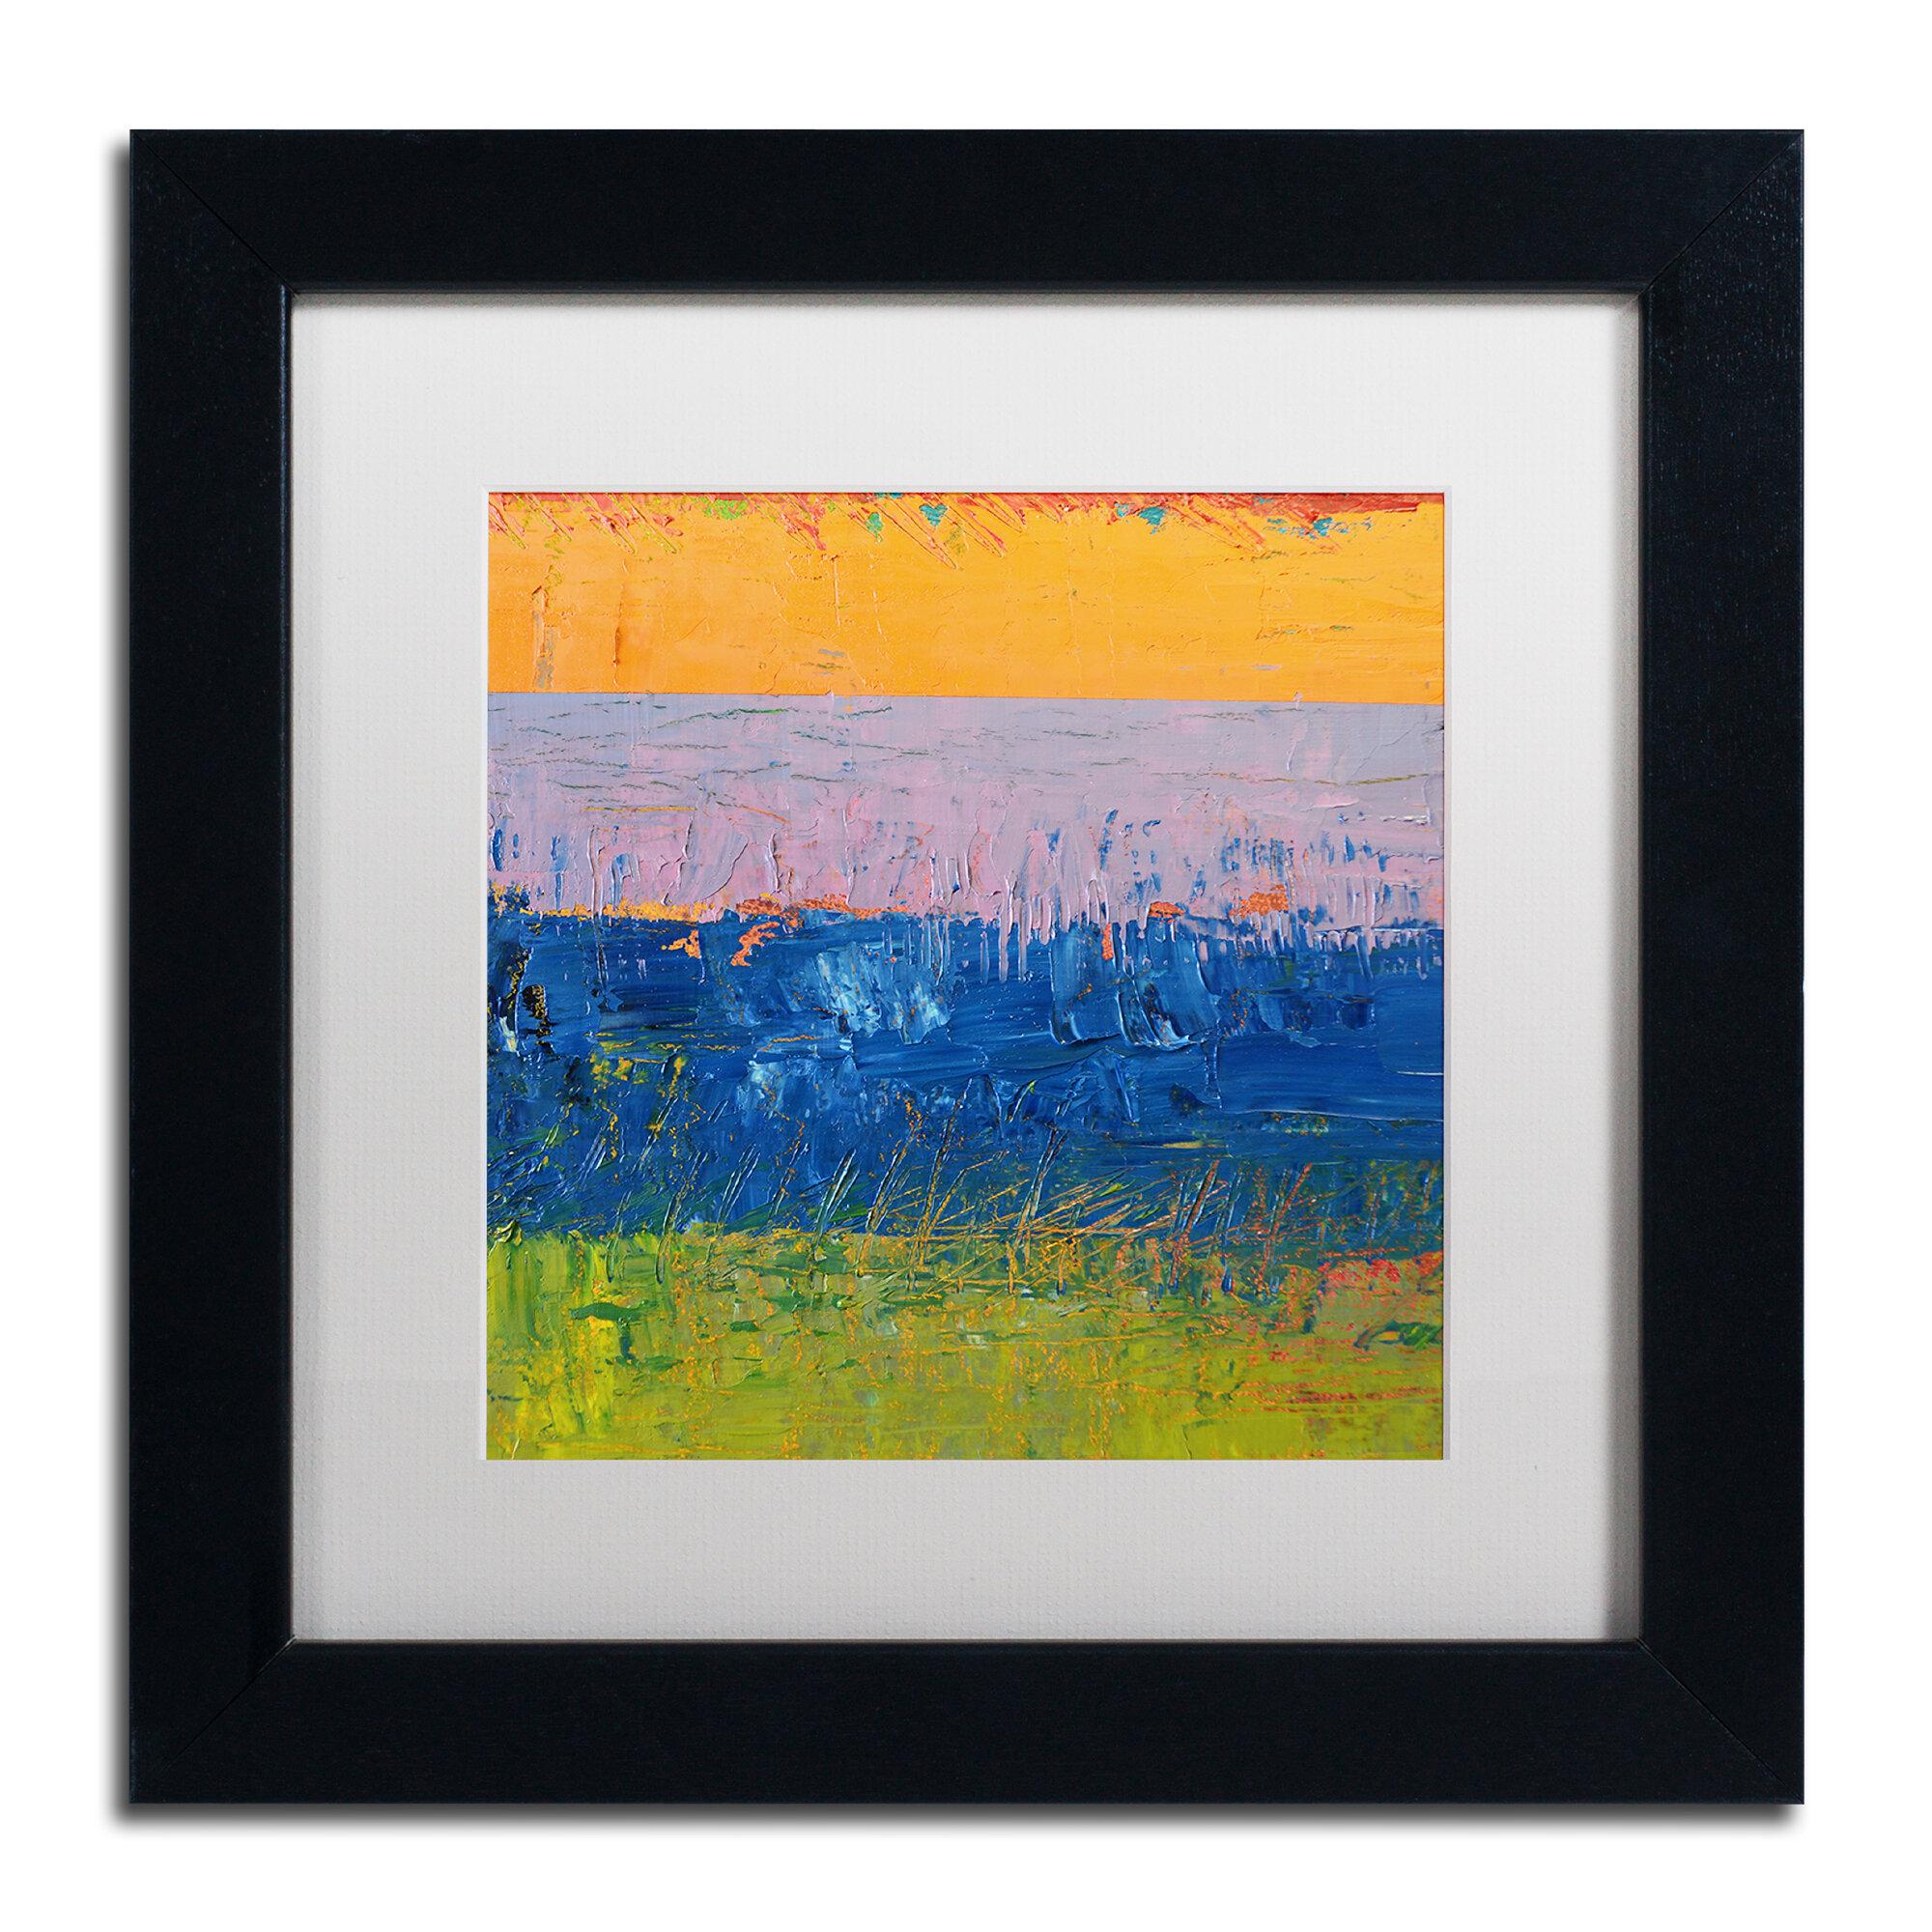 Trademark Art Thistle Field By Michelle Calkins Framed Print On Canvas Wayfair